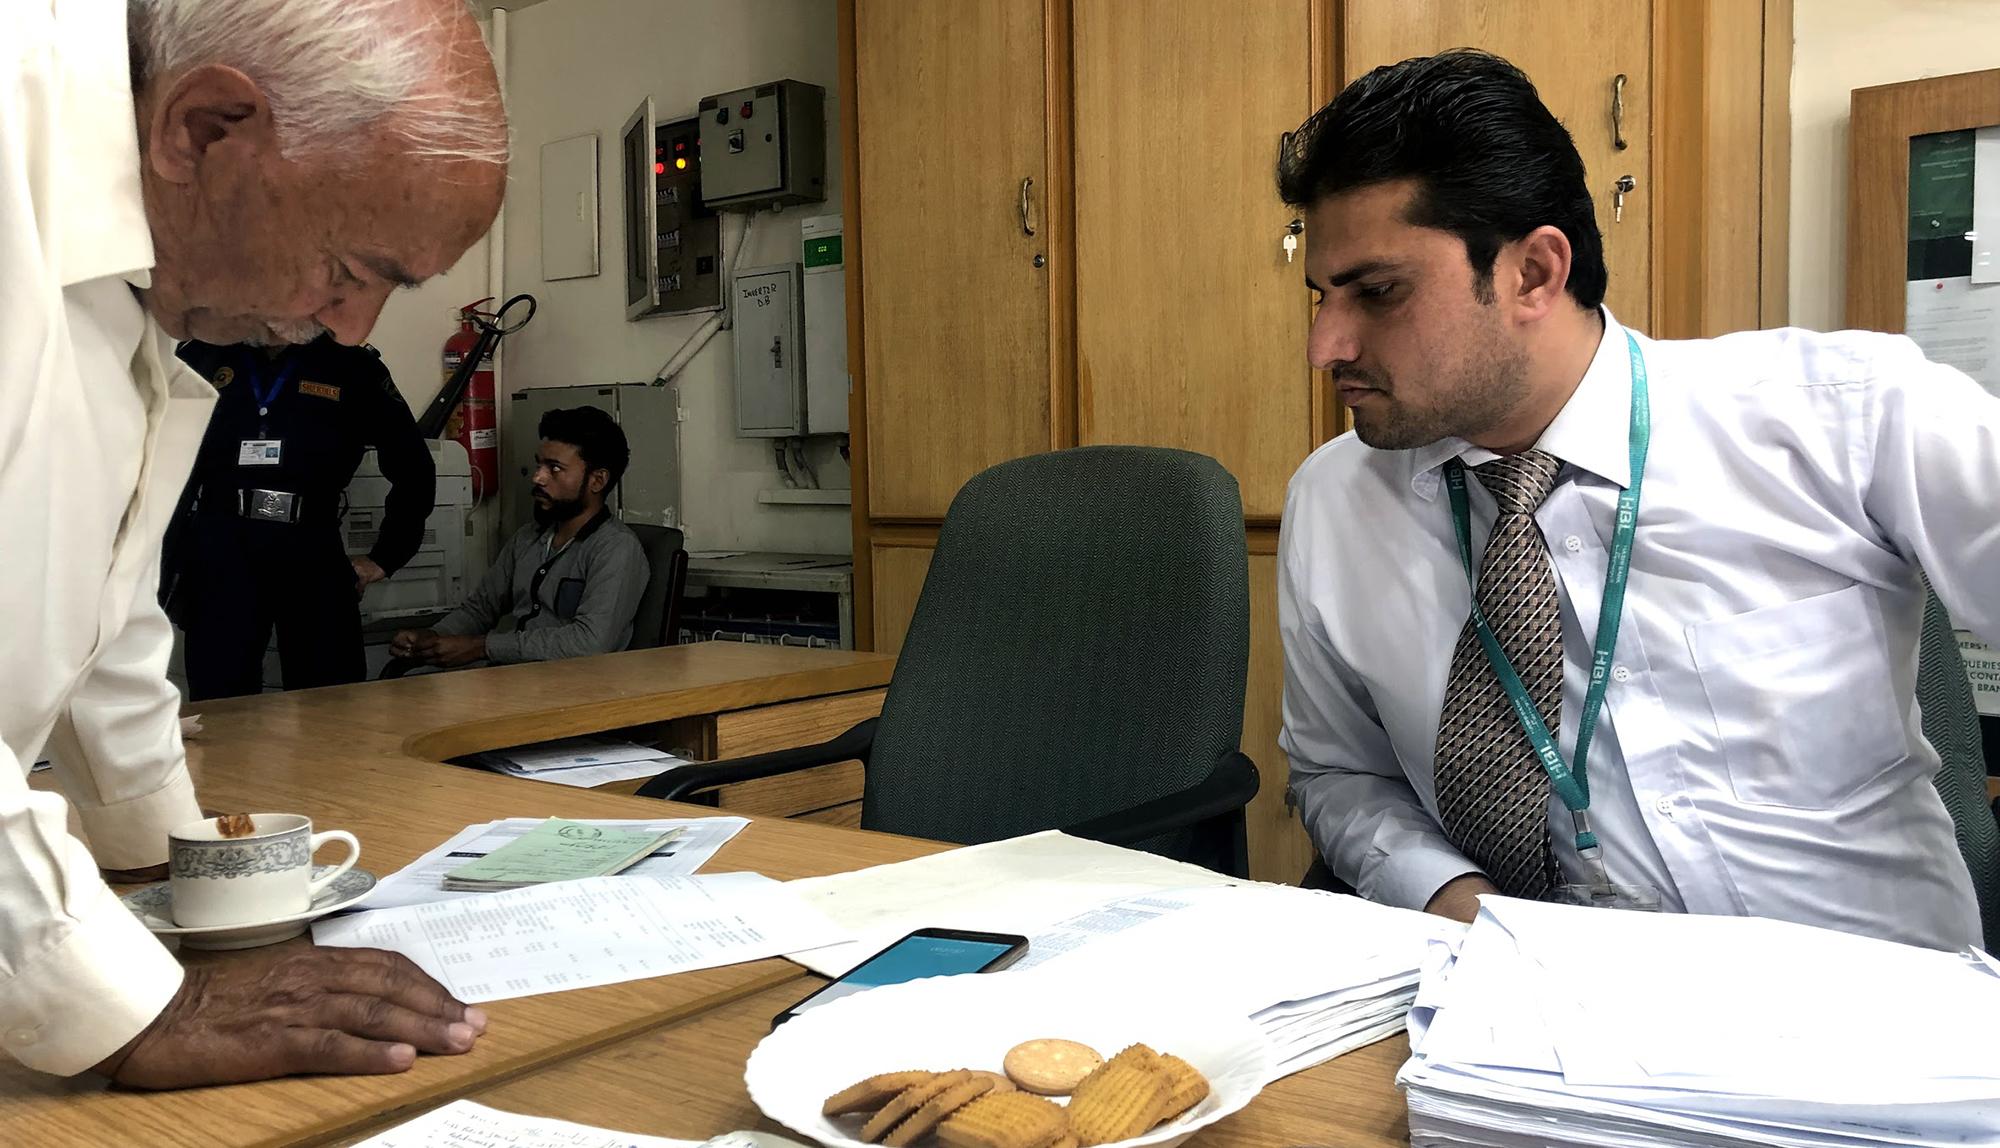 A smallholder farmer inquiring about loan applications at a bank near Kasur (Pakistan)